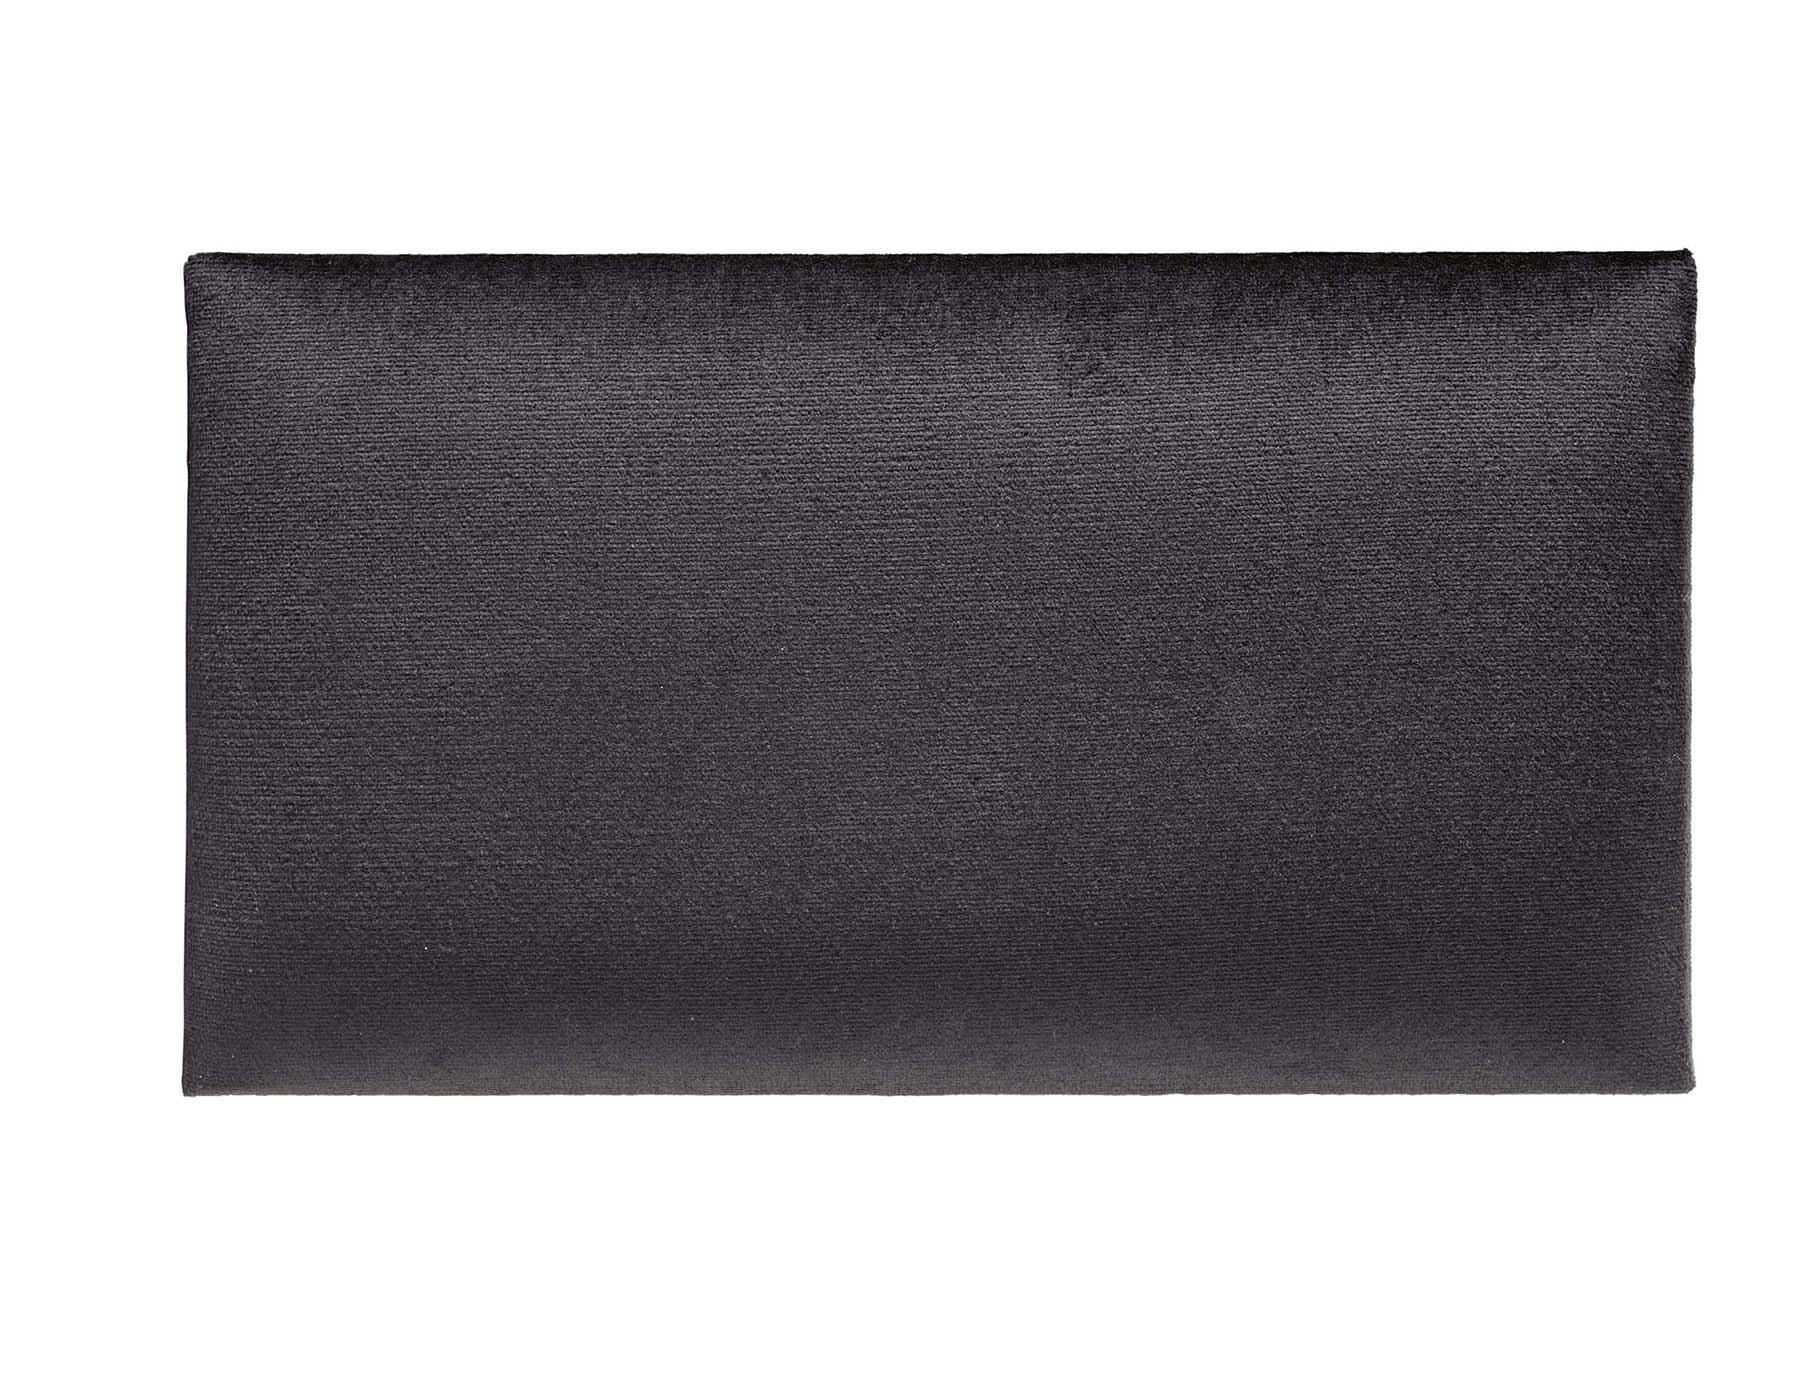 KM1380 - Seat cushion - velvet